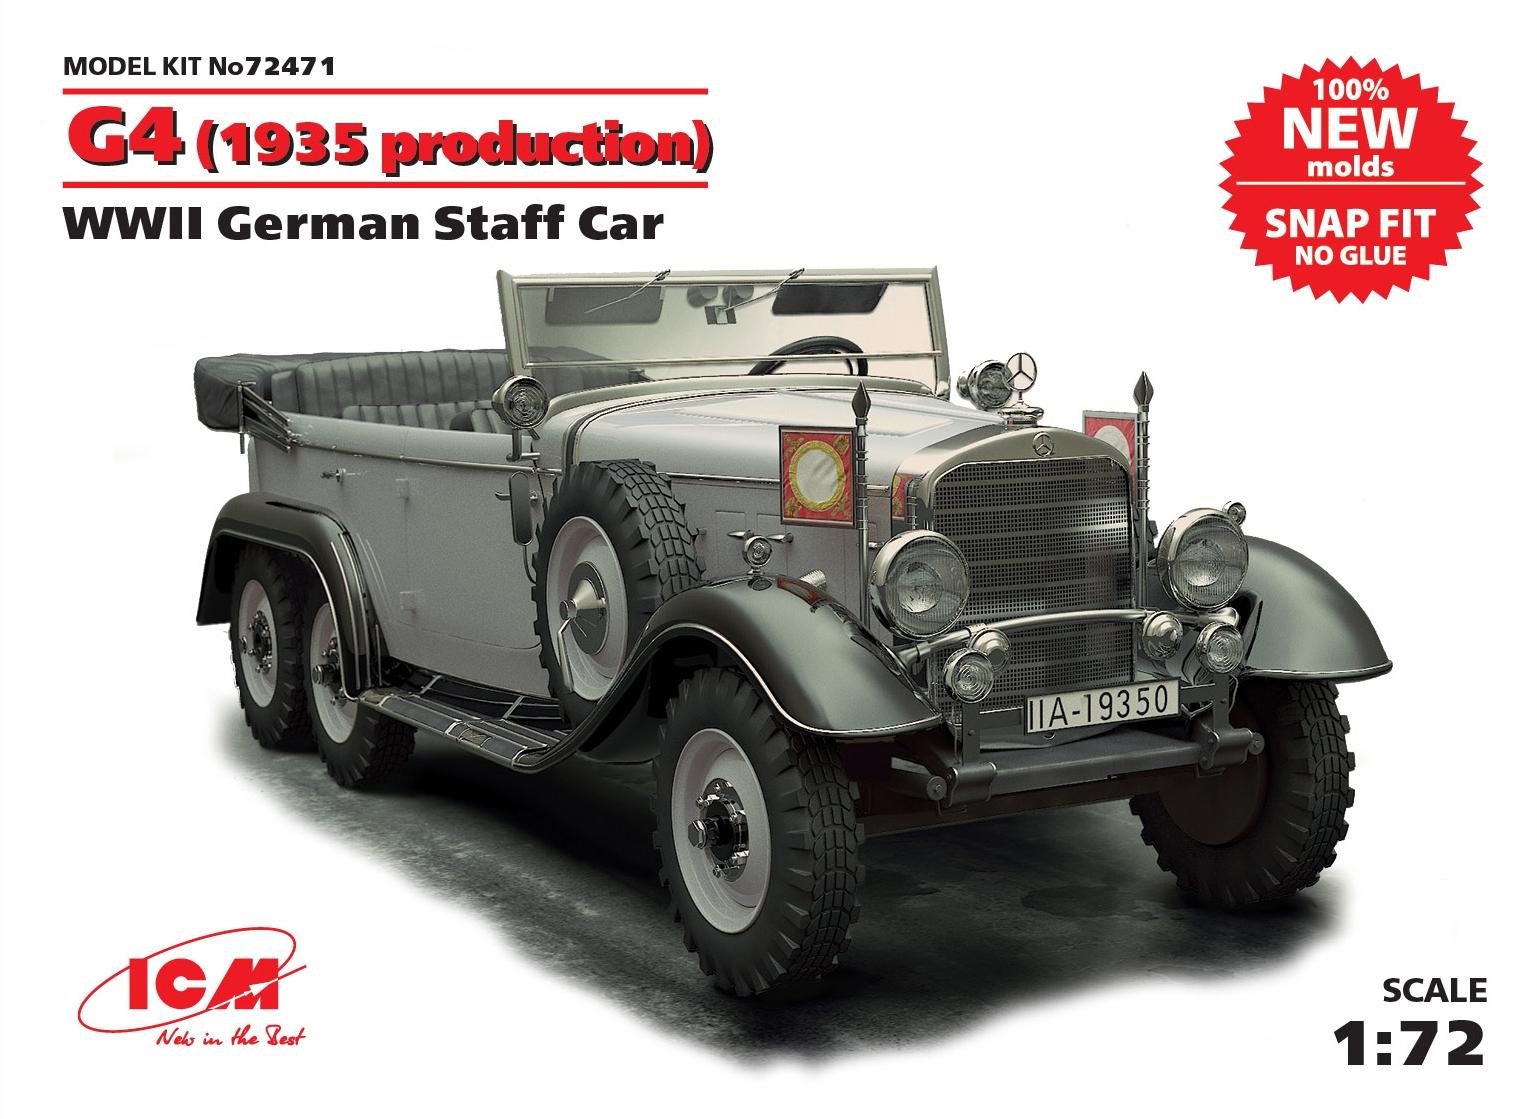 ICM G4 (1935 production), WWII German Staff Car,  snap fit/no glue